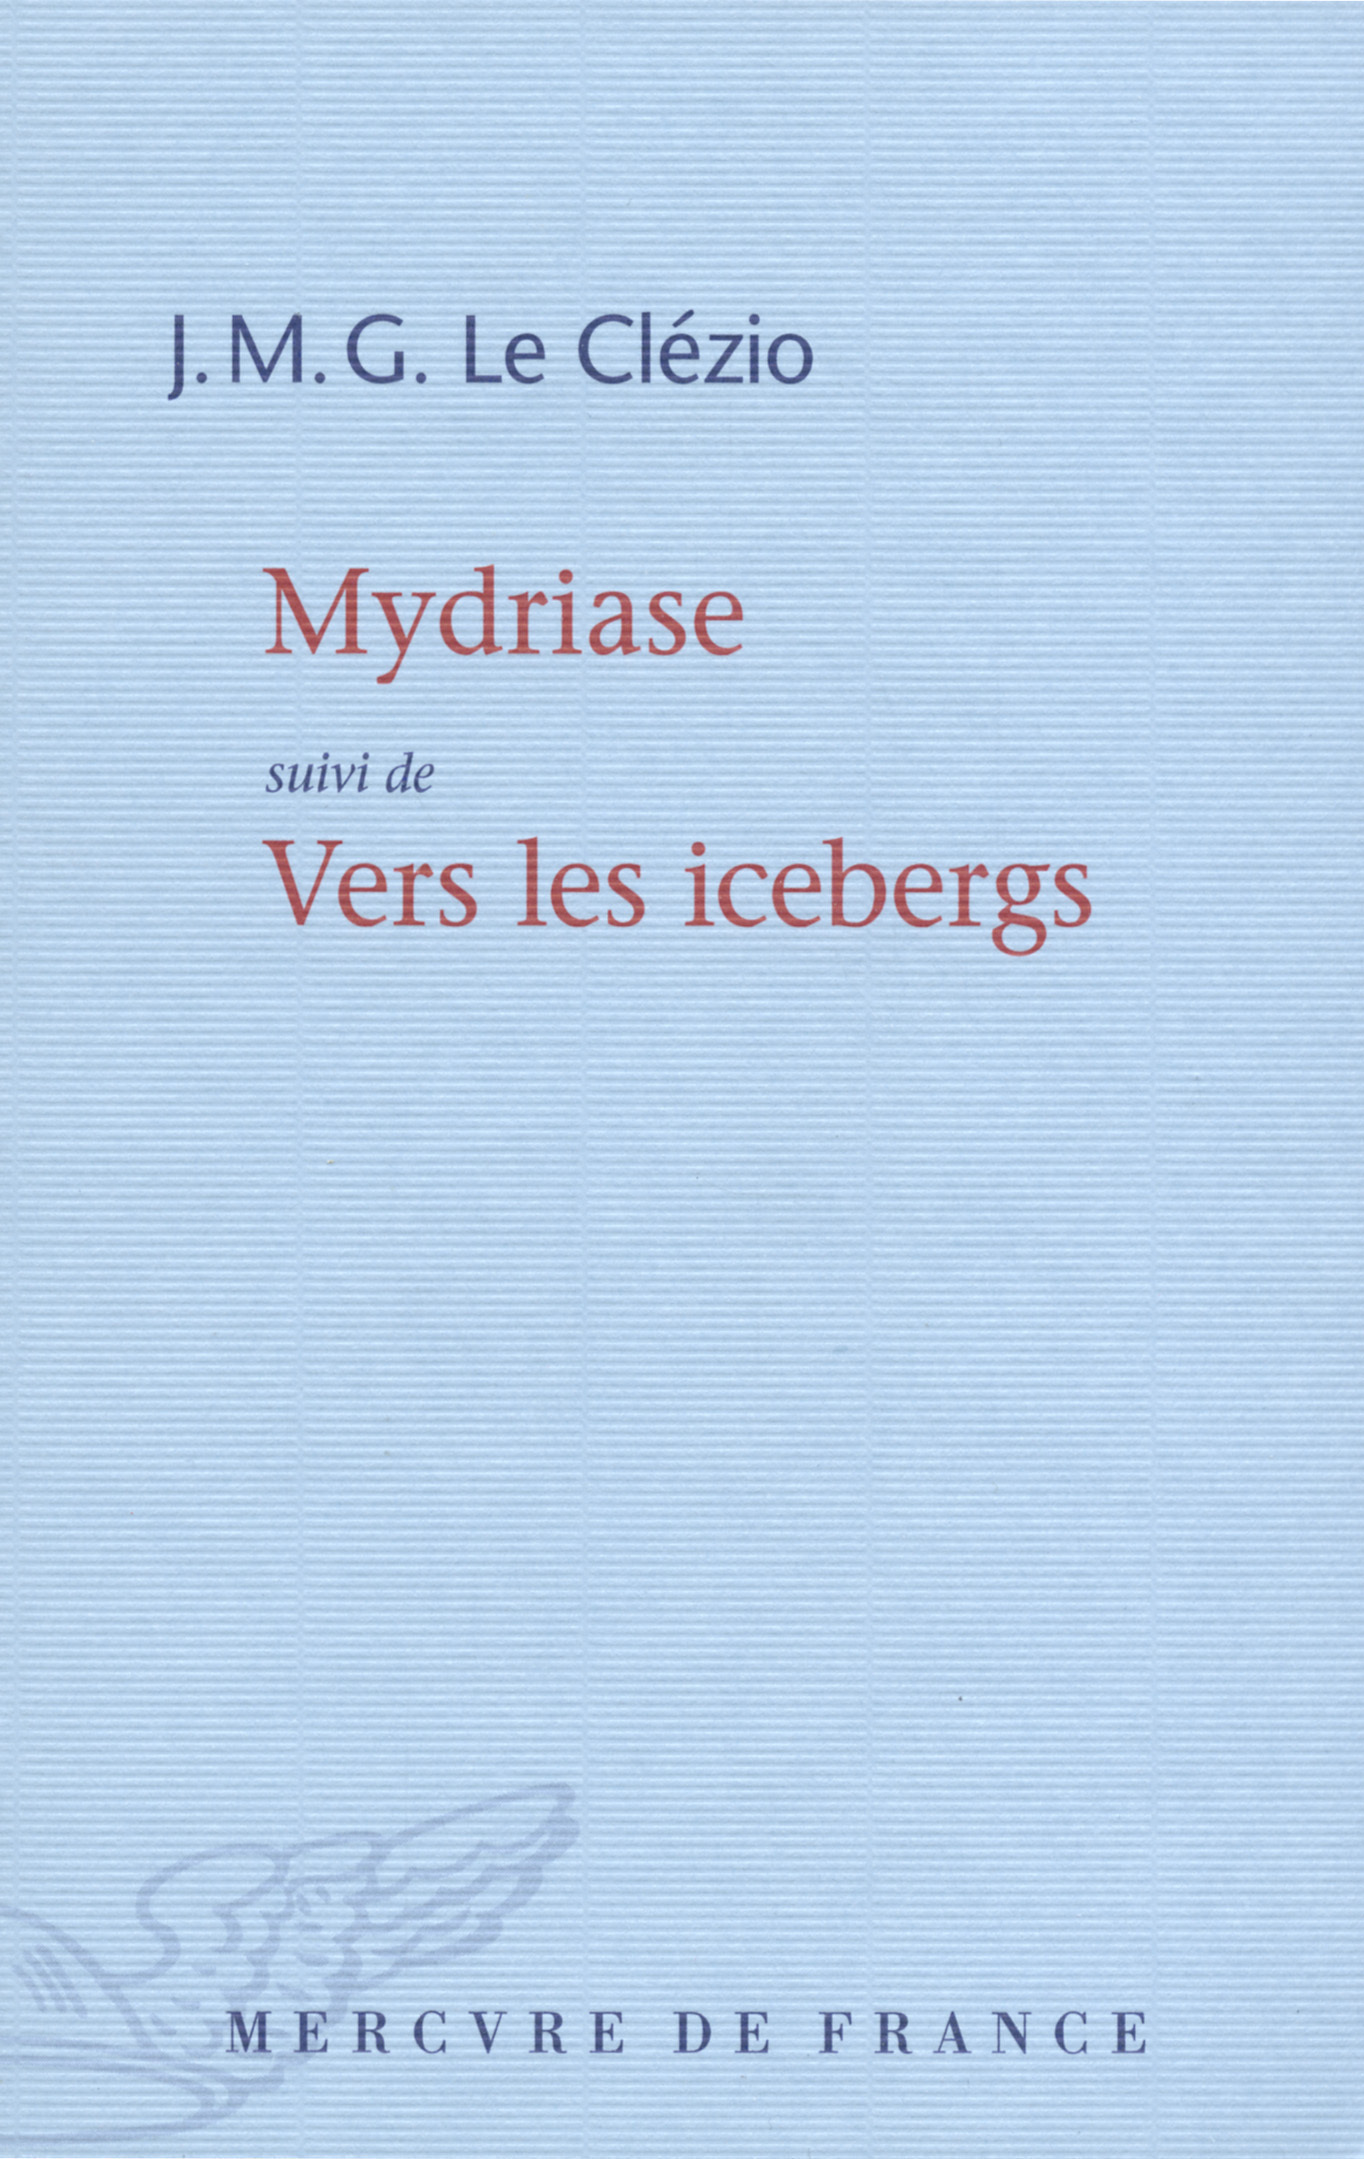 Mydriase / Vers les icebergs